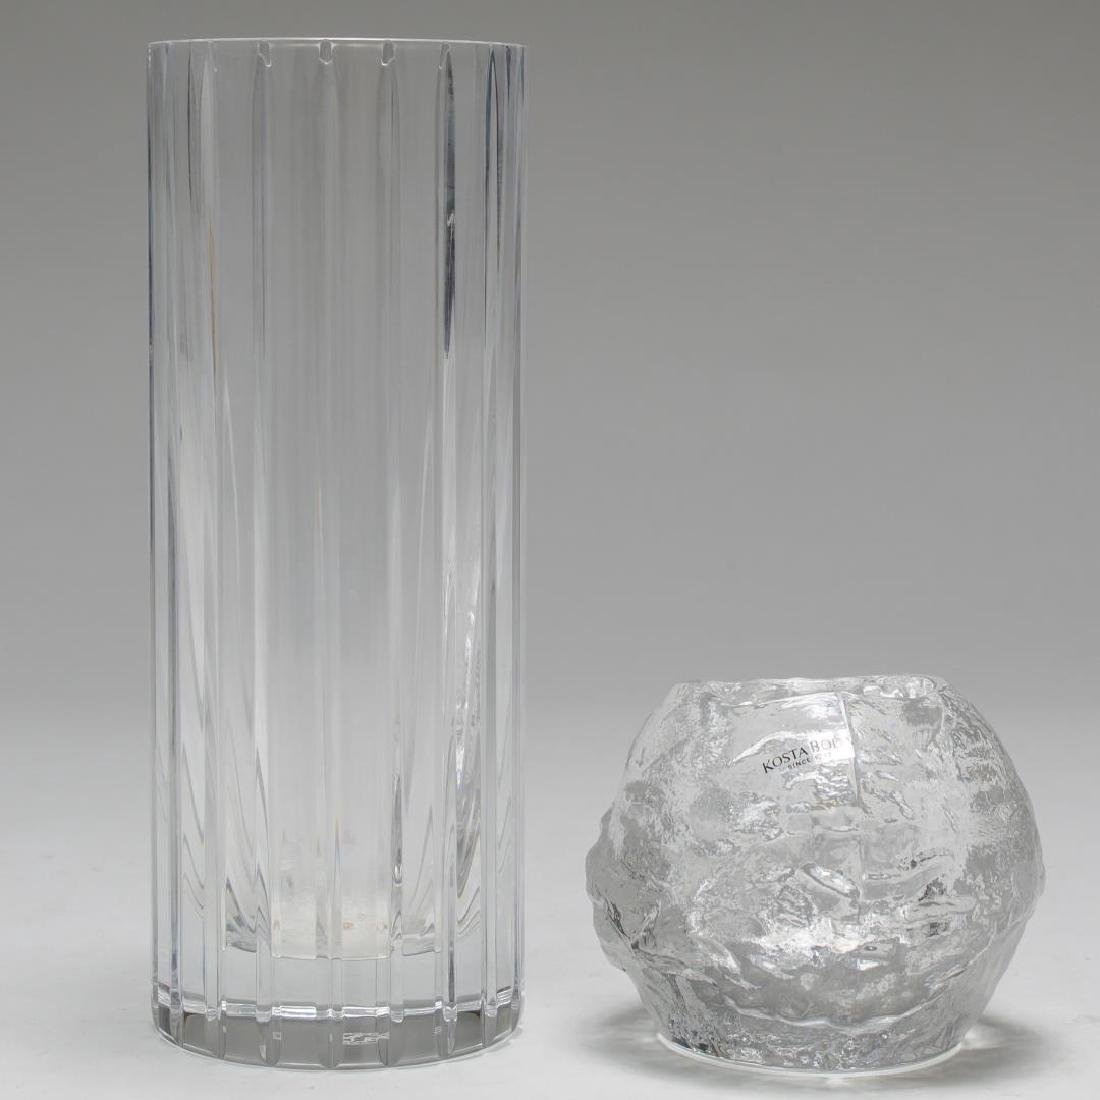 Baccarat Crystal Vase & Kosta Boda Votive Holder